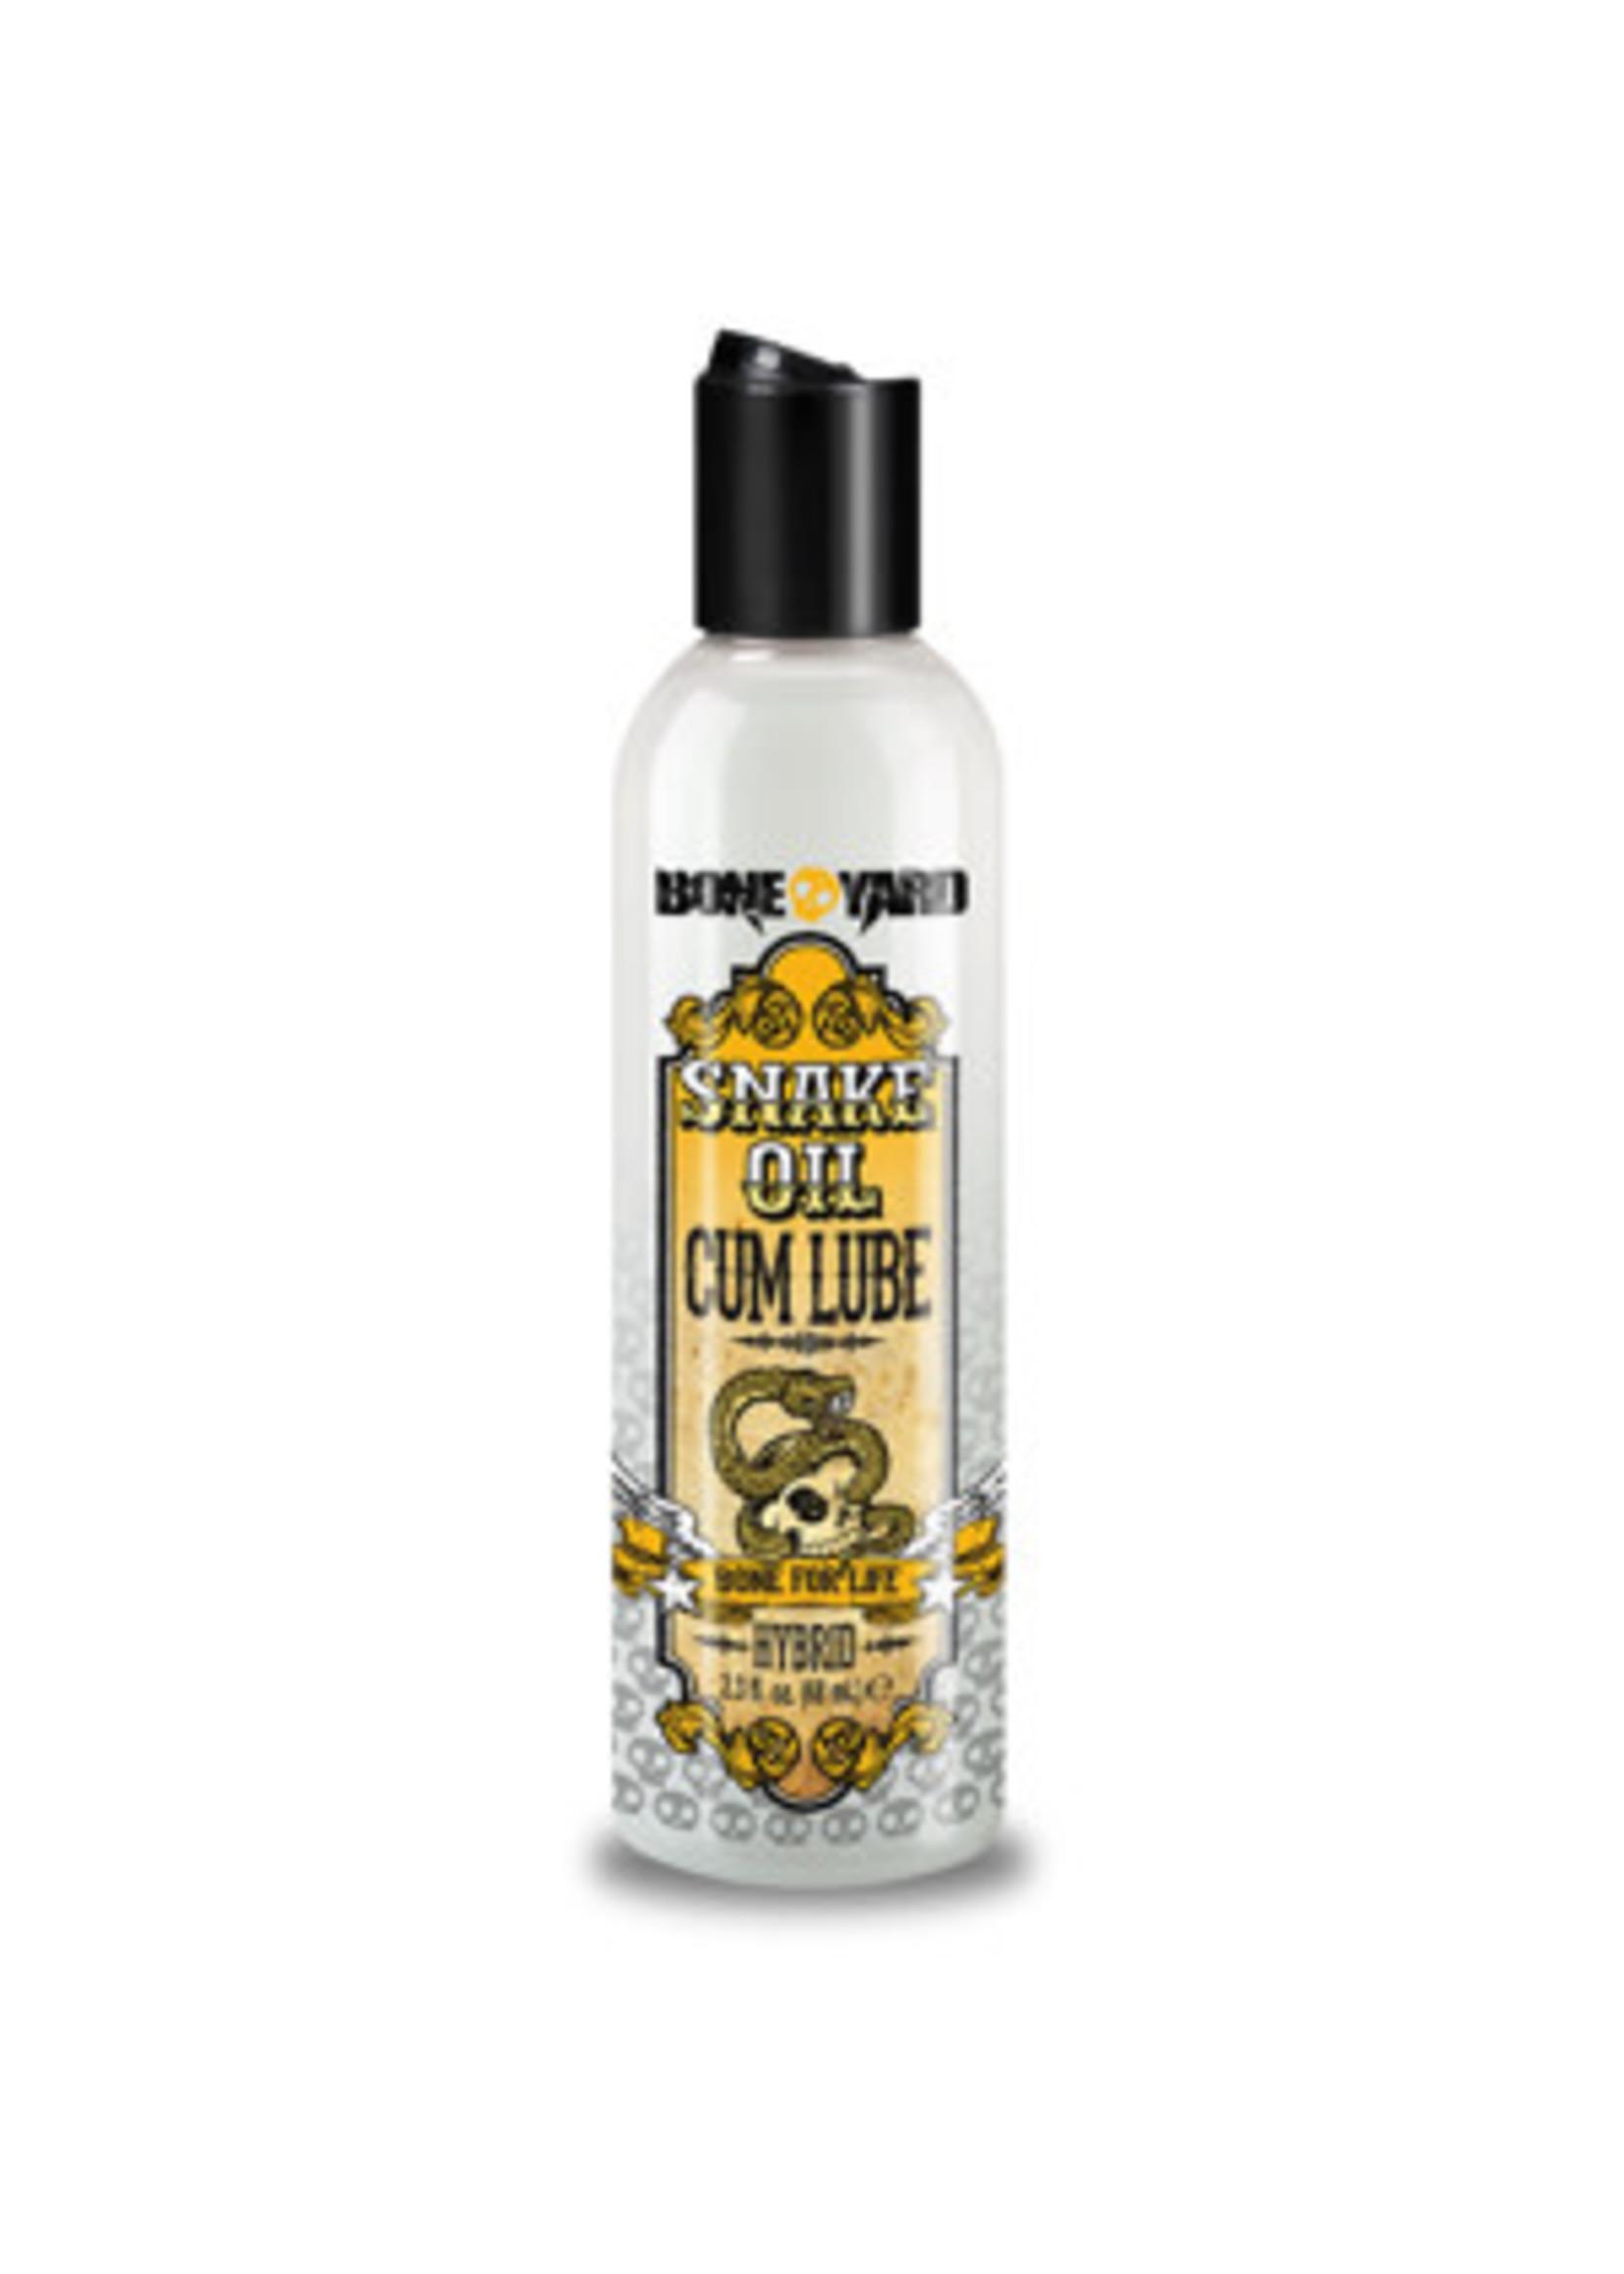 Boneyard Boneyard Snake Oil Cum Lube